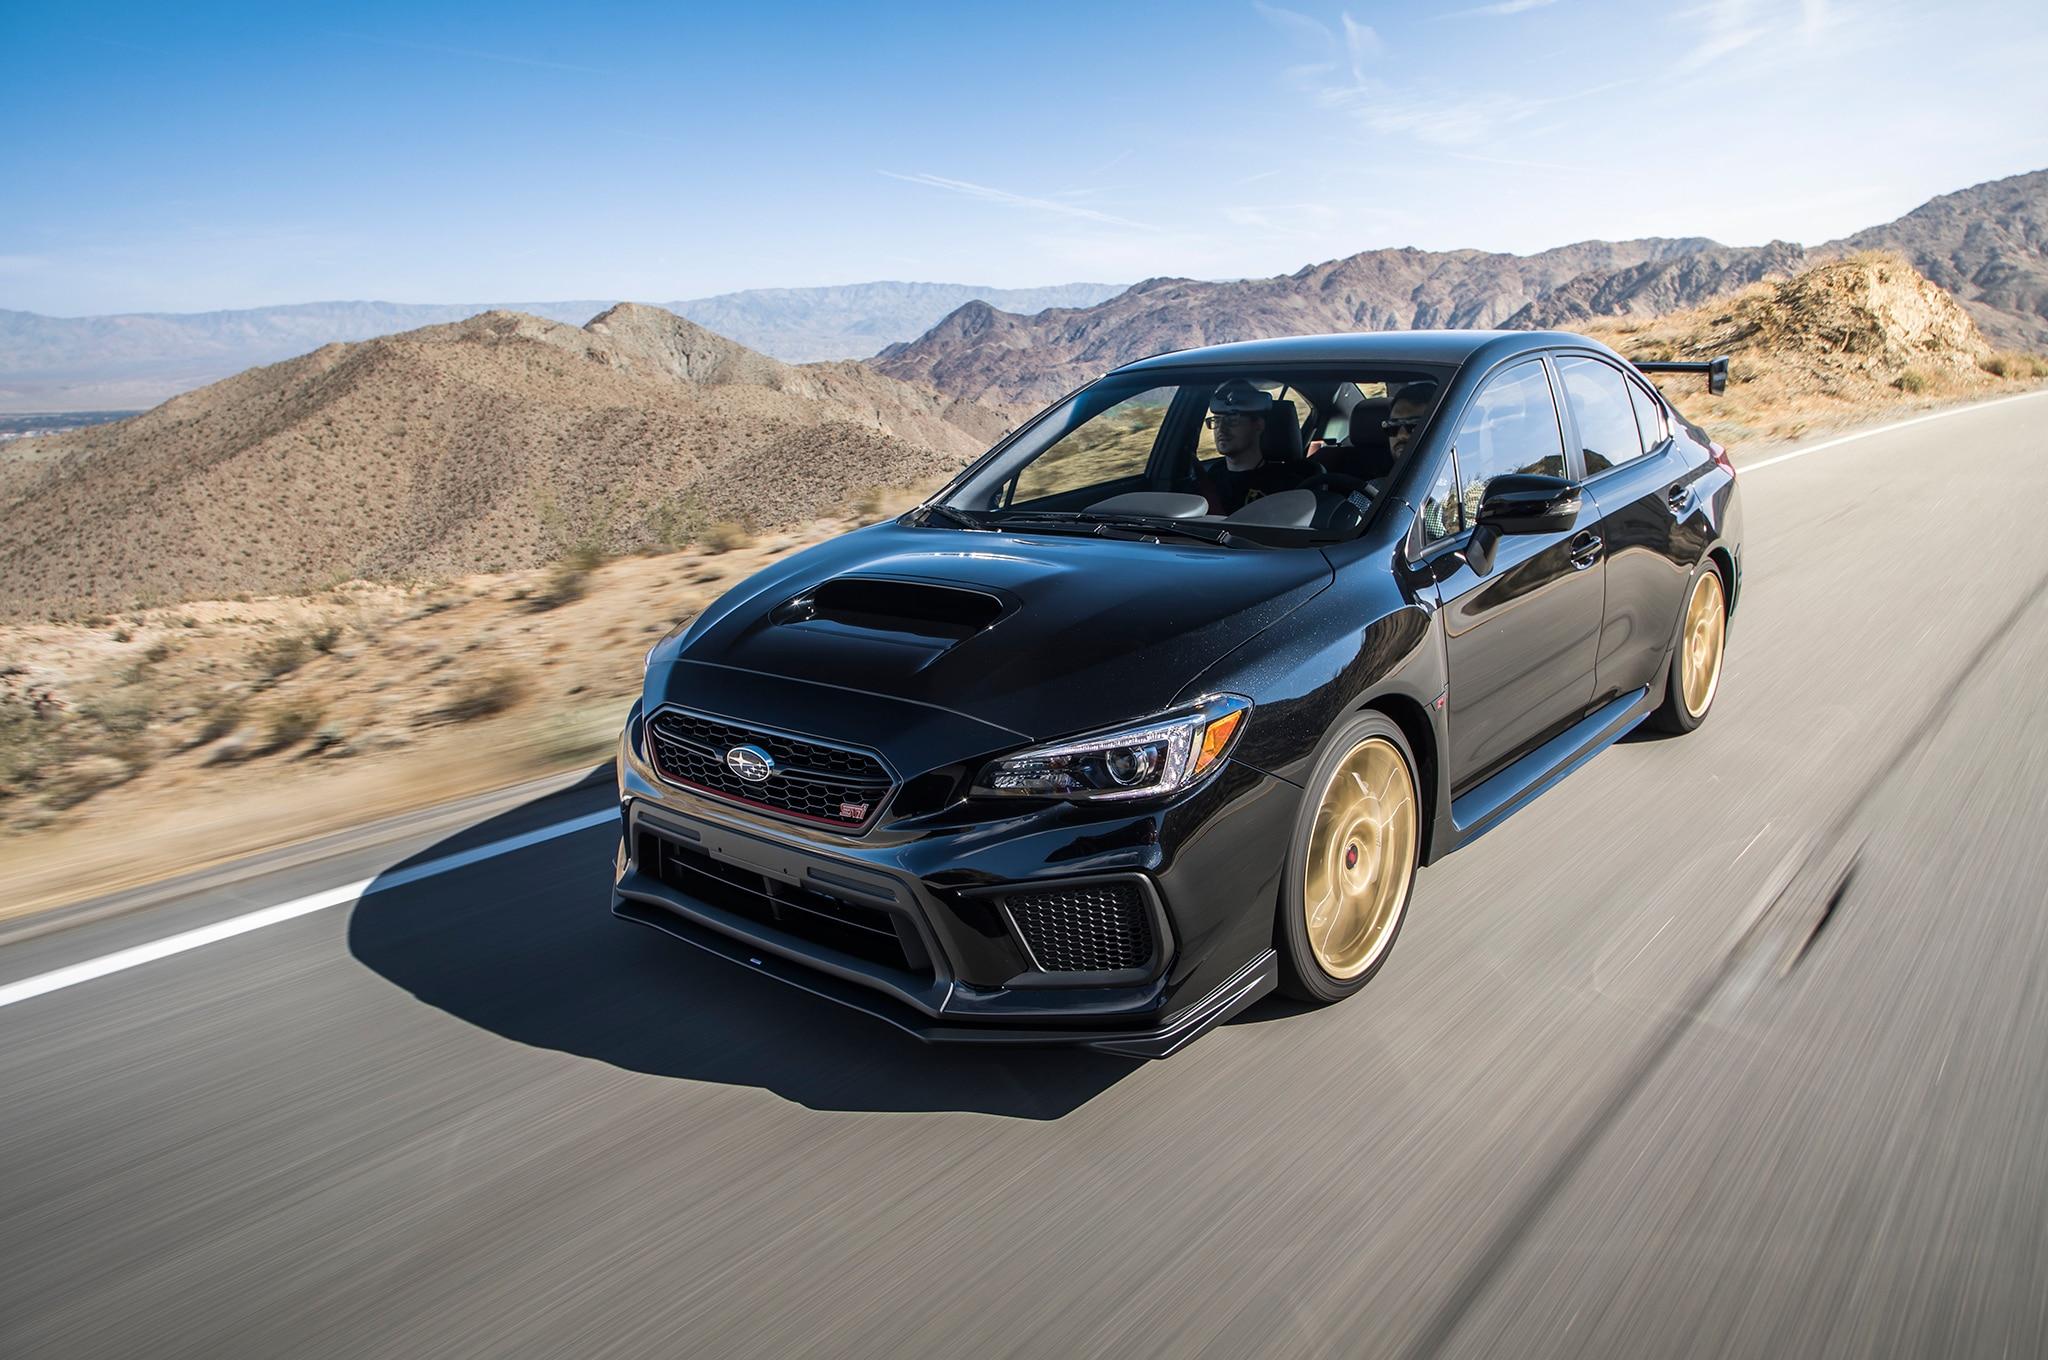 2018 Subaru WRX STI Type RA Front Three Quarter In Motion 44